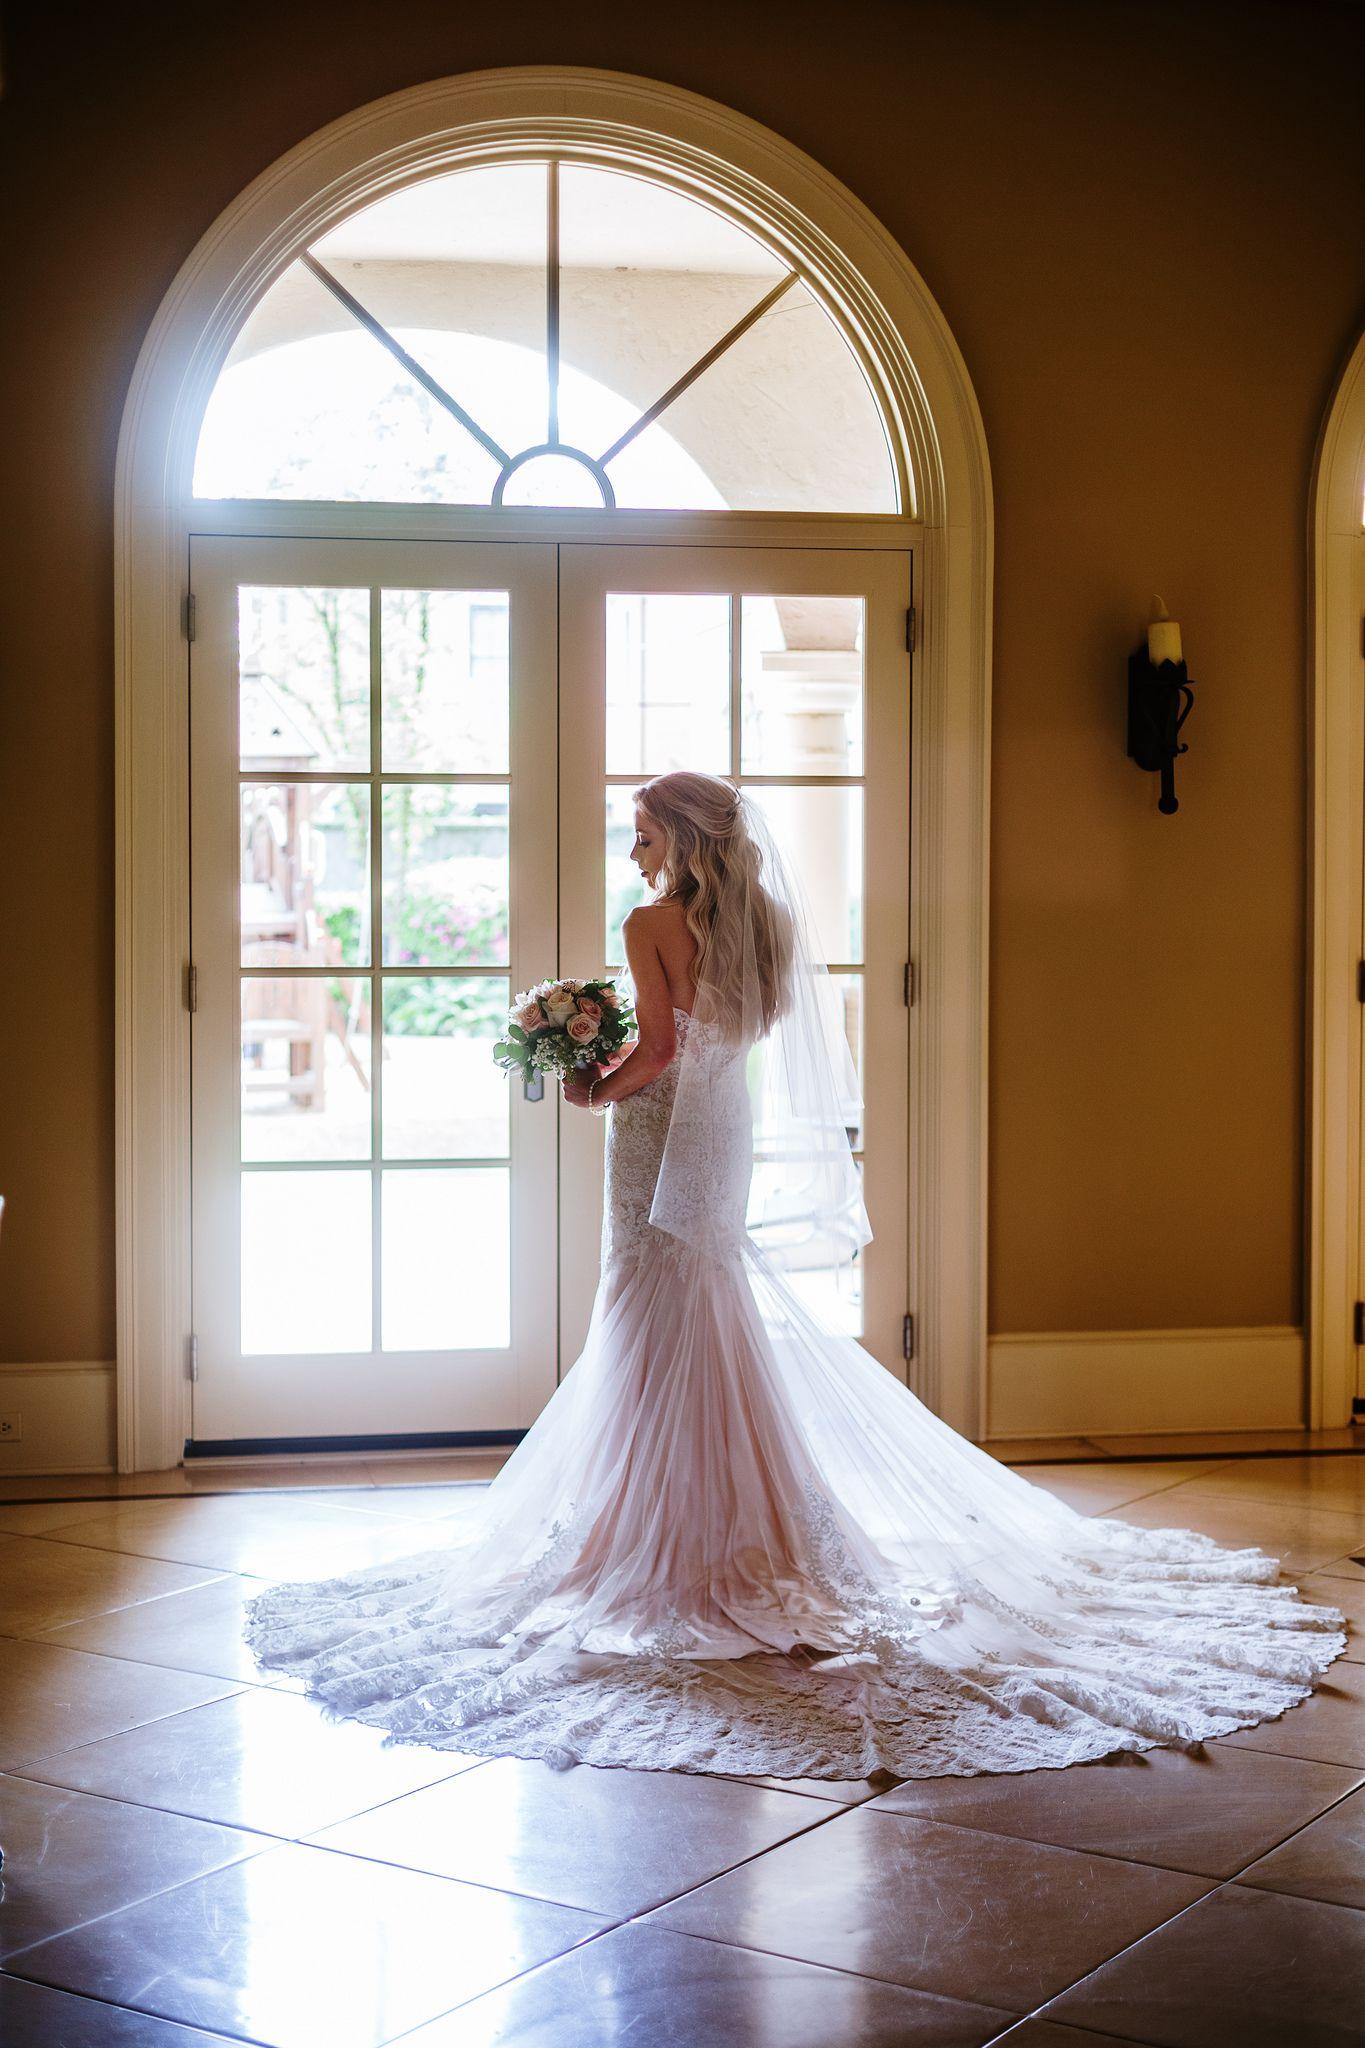 Giverny Wedding Photo Film Bridal Photo Session At River Oaks Houston Tx Bridal Bridal Photos Wedding Photos